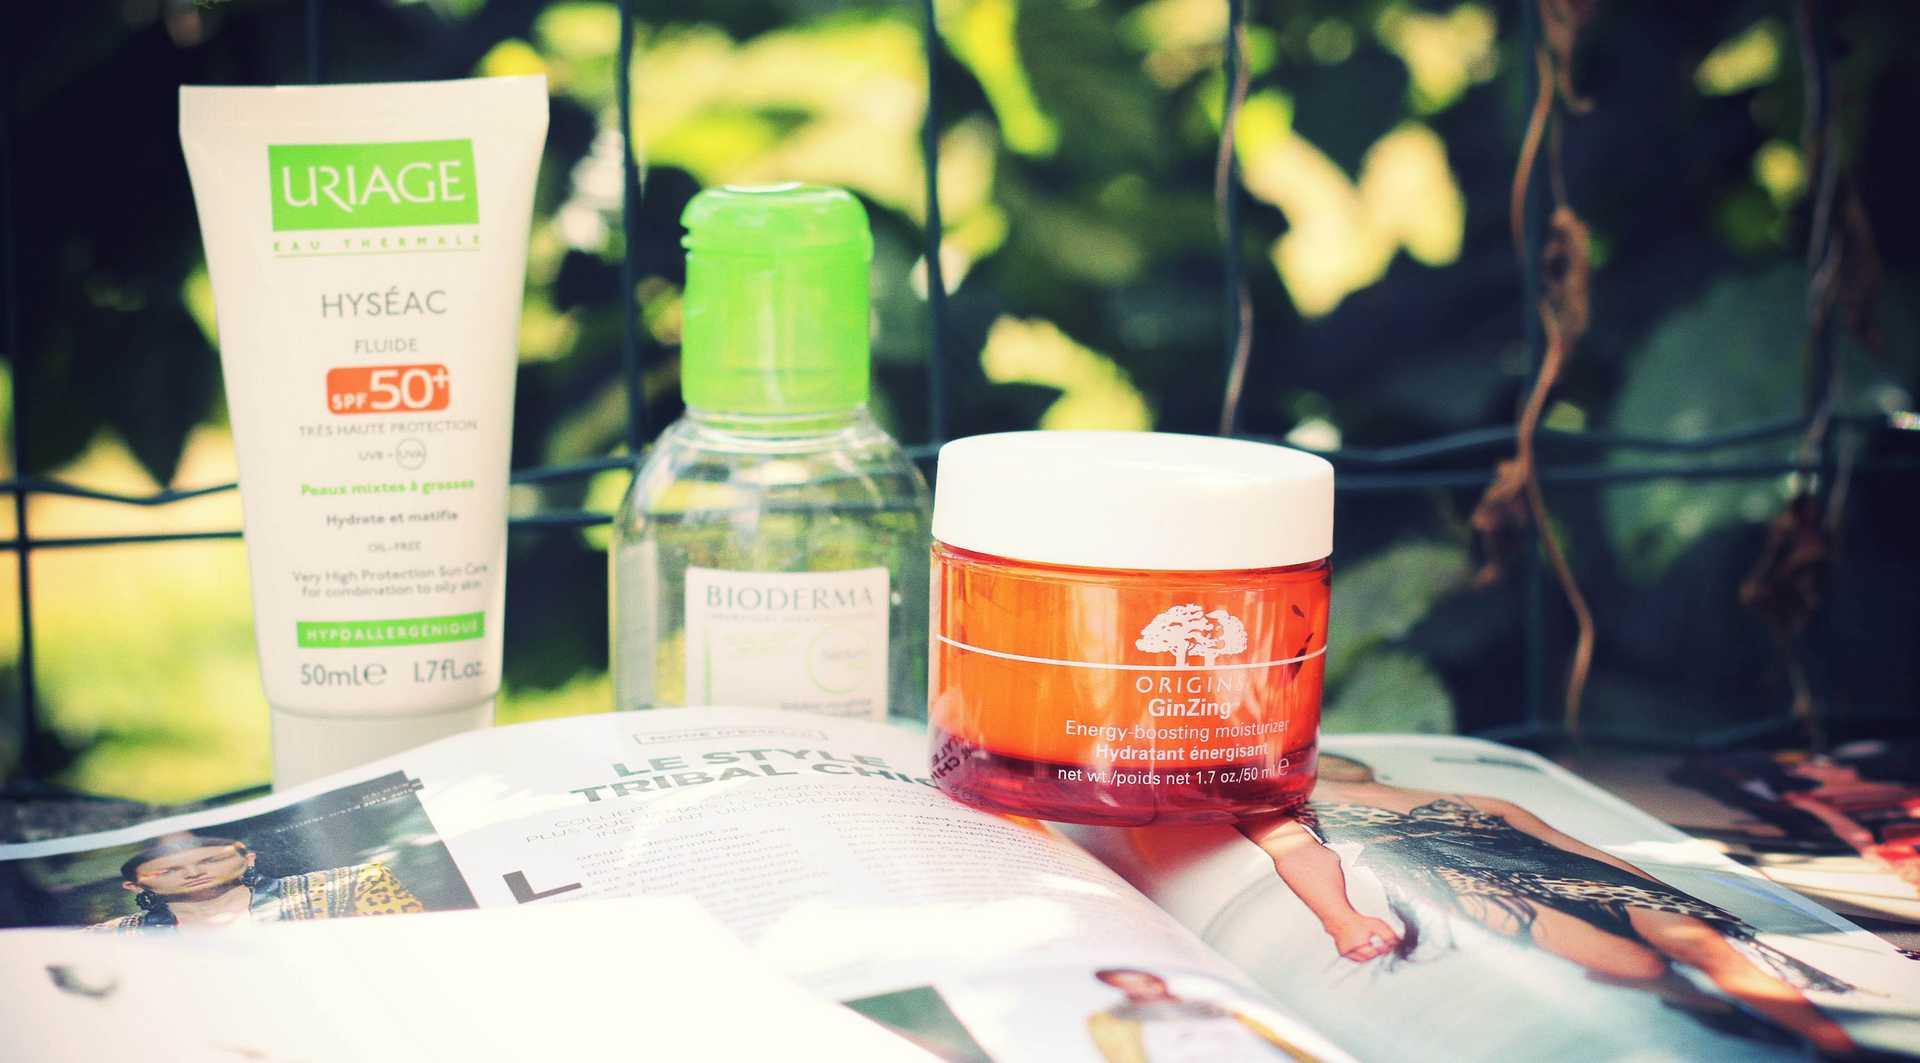 nunaavane-beauty-blogger-july-favorites-summer-makeup-skincare6